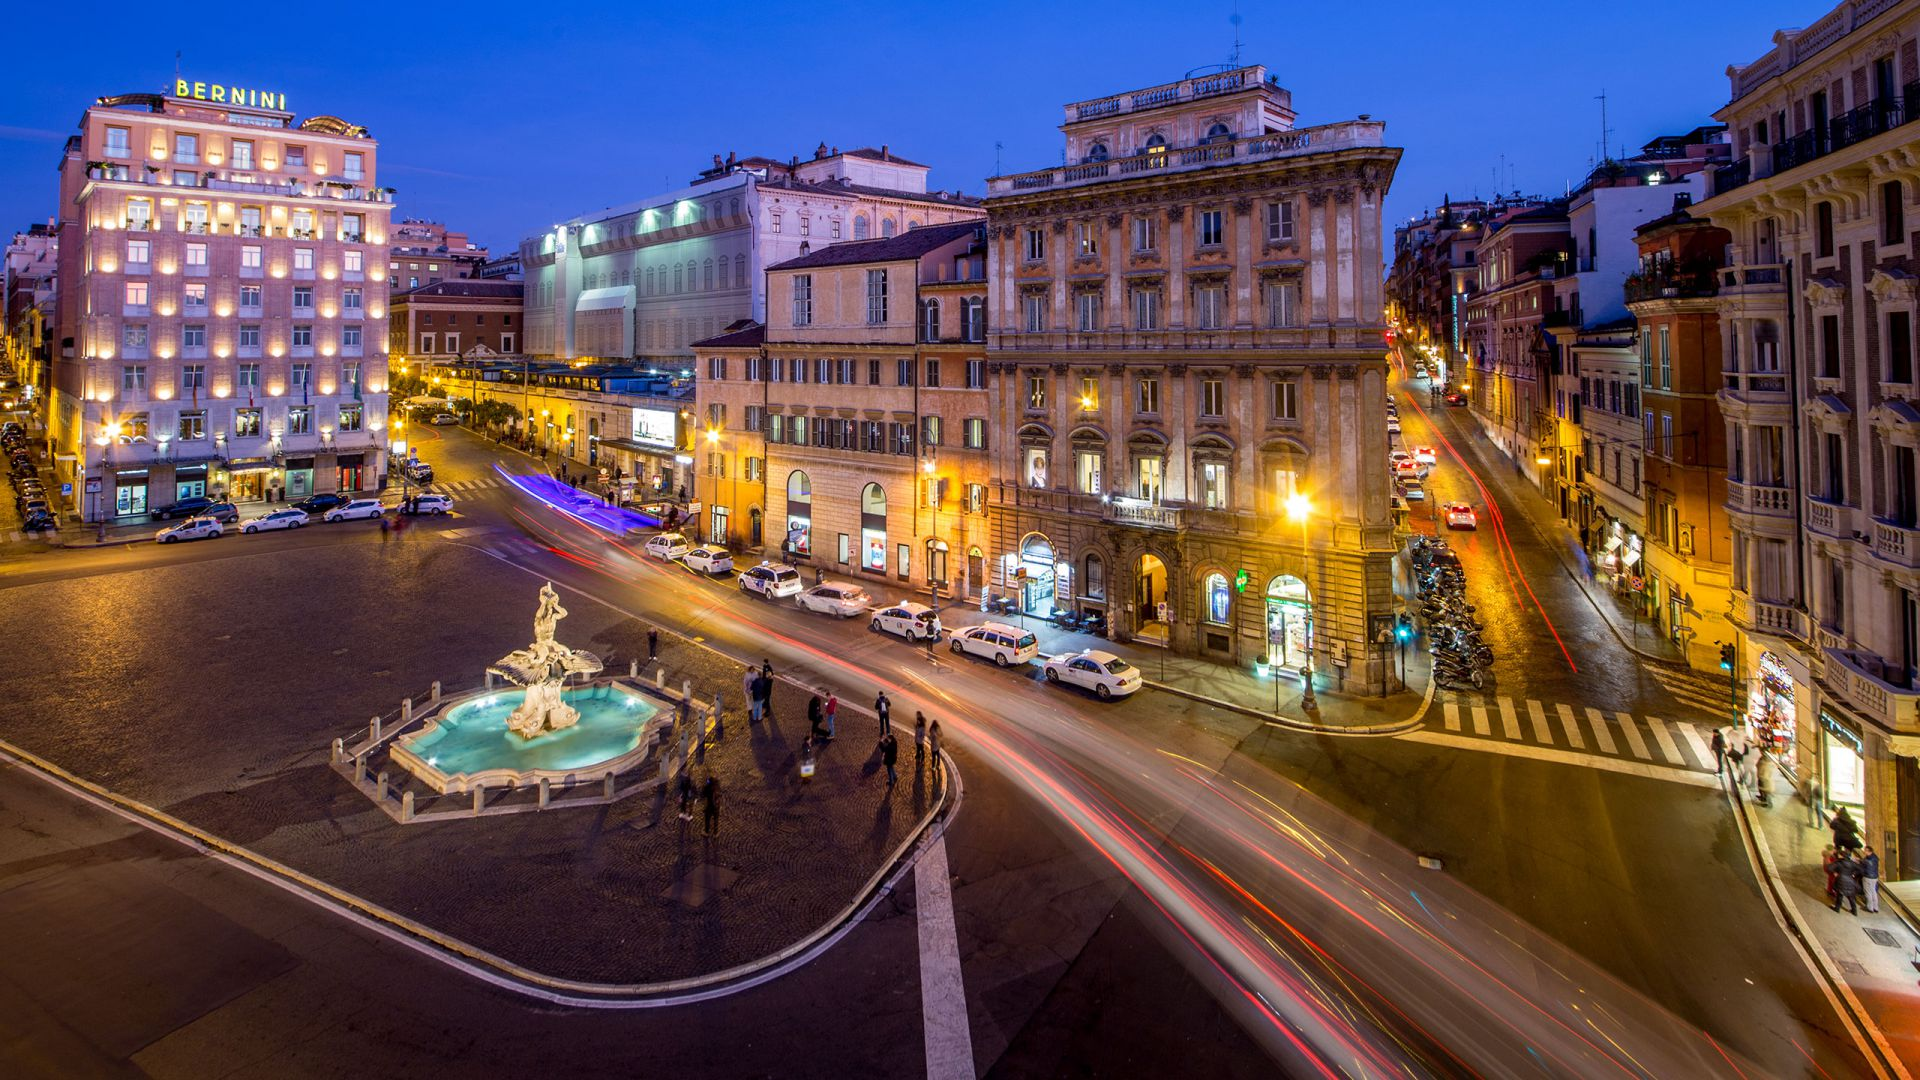 albergo-ottocento-rome-monuments-01